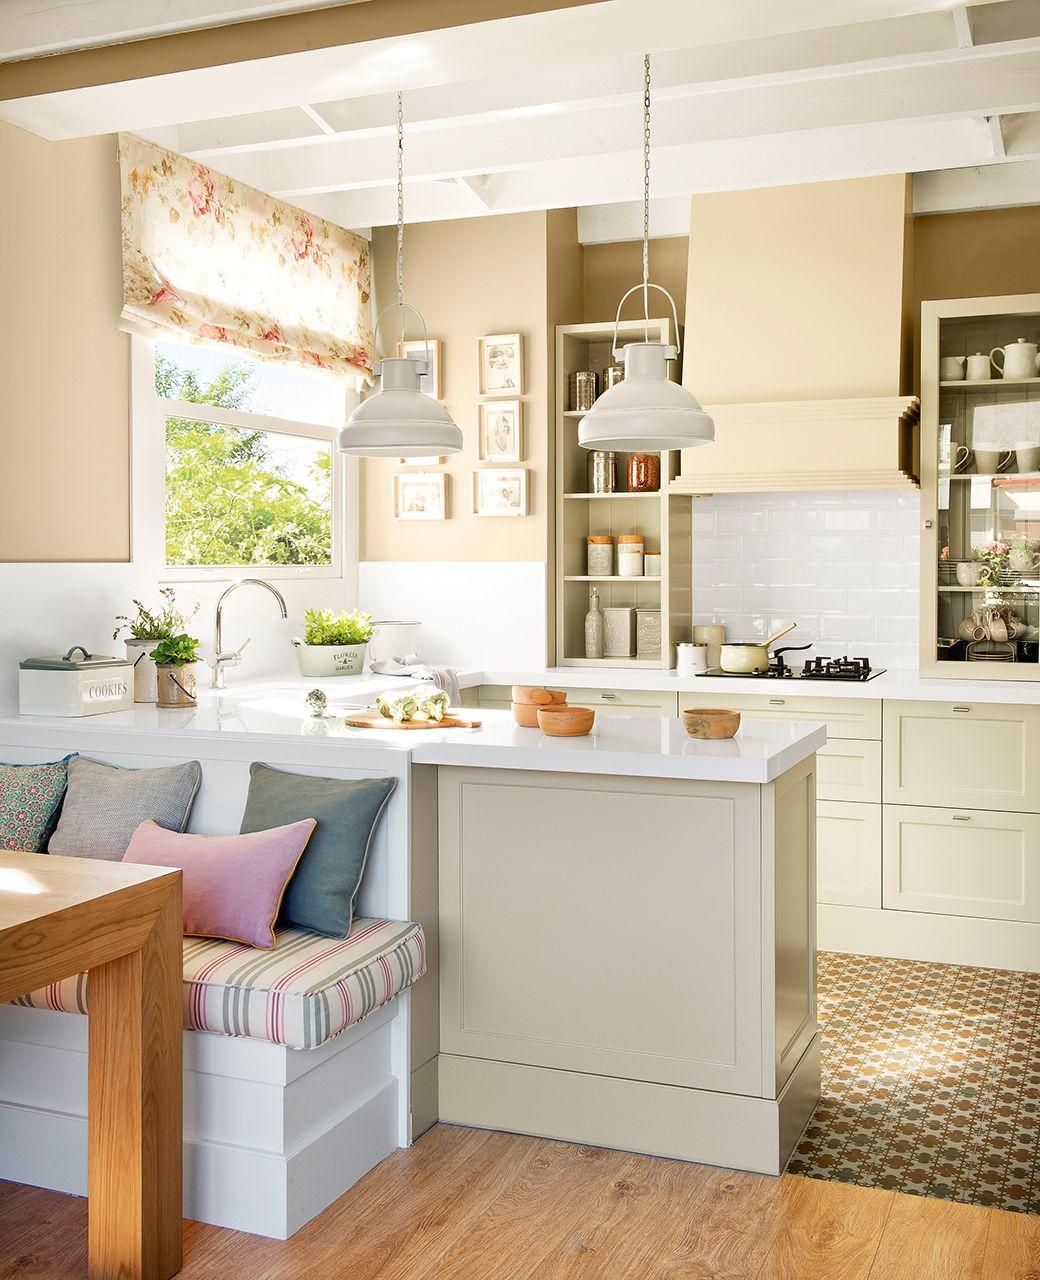 Peque a cocina con pen nsula y office armarios tonos - Ideas de cocinas pequenas ...